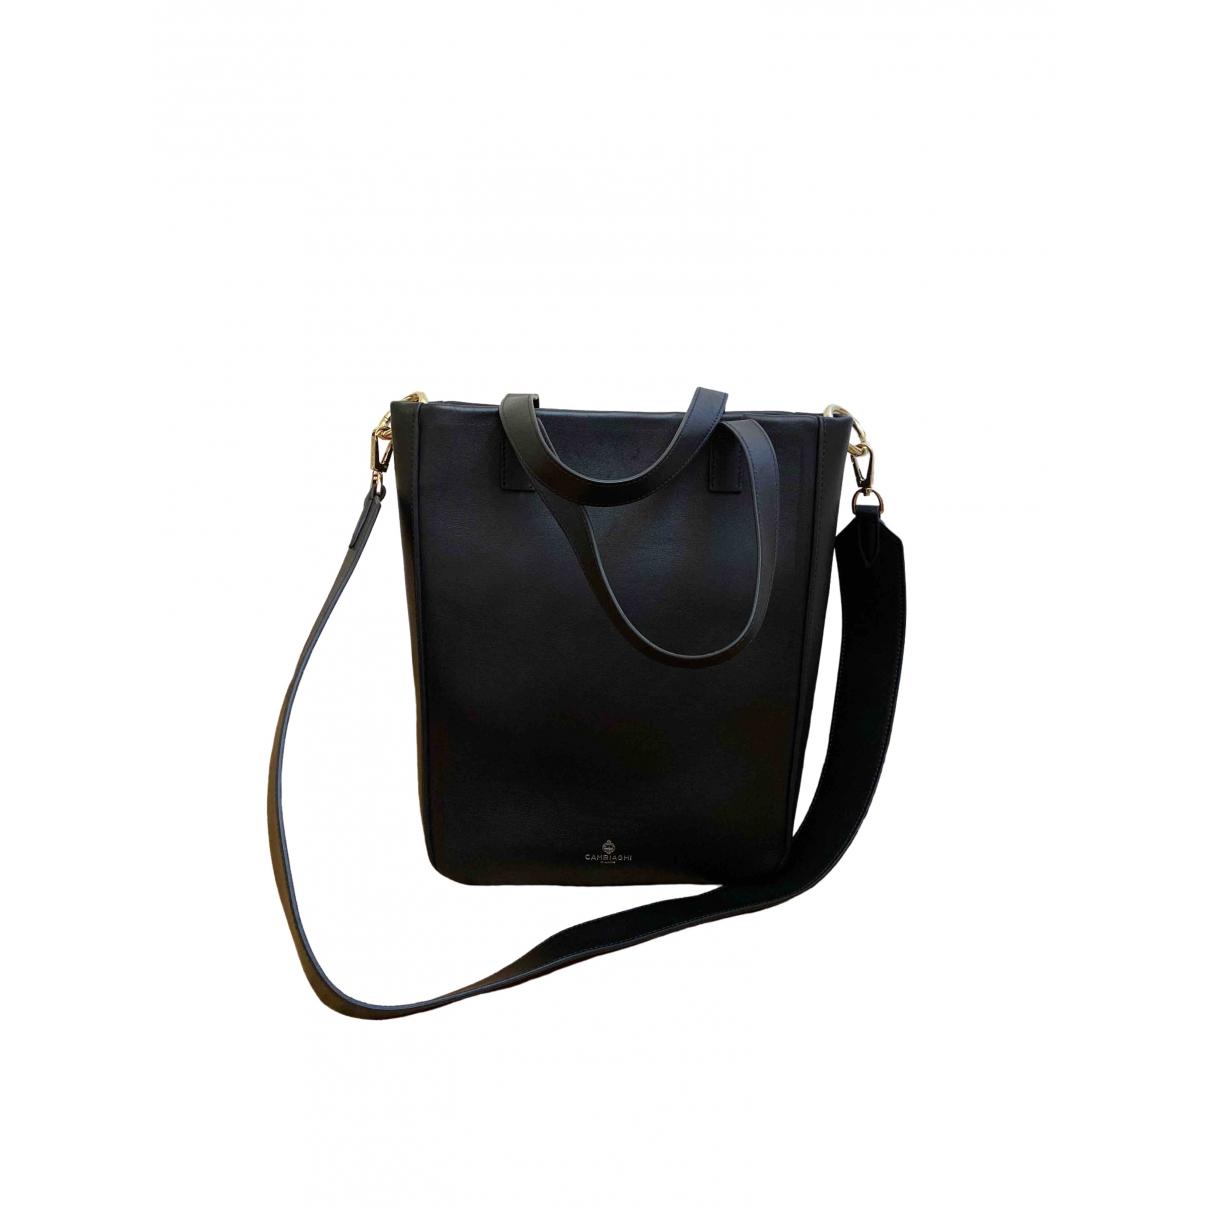 Cambiaghi \N Black Leather handbag for Women \N